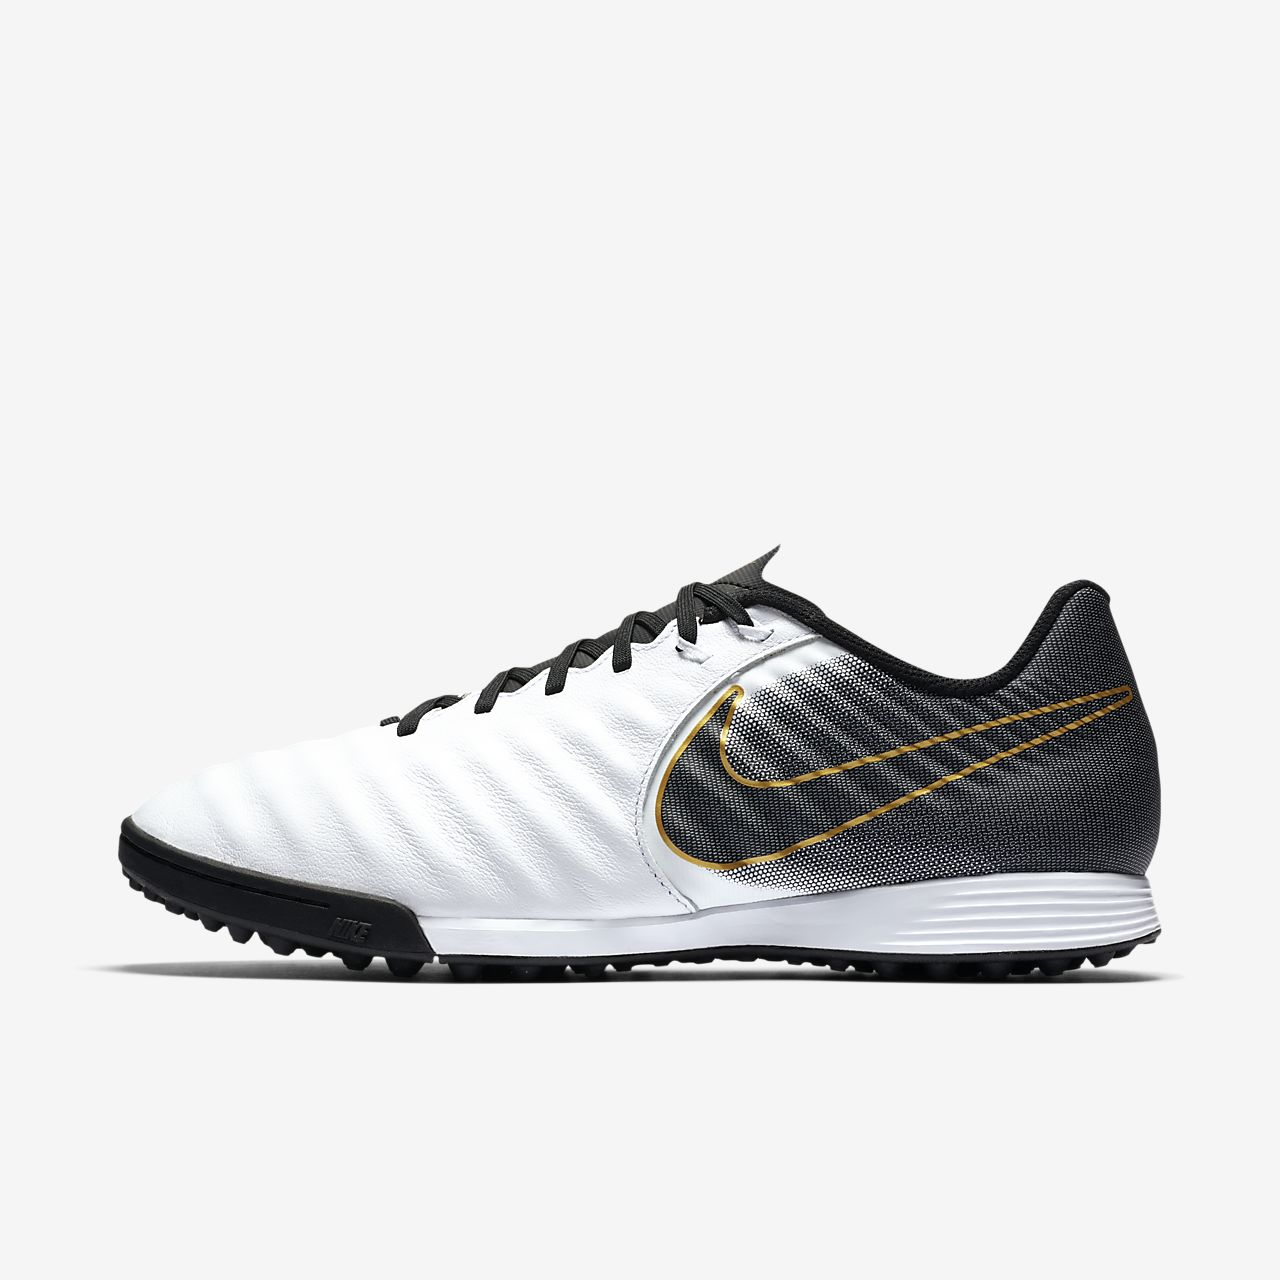 De Nike Football Pour À Synthétique Chaussure Crampons Surface vPxawqHd